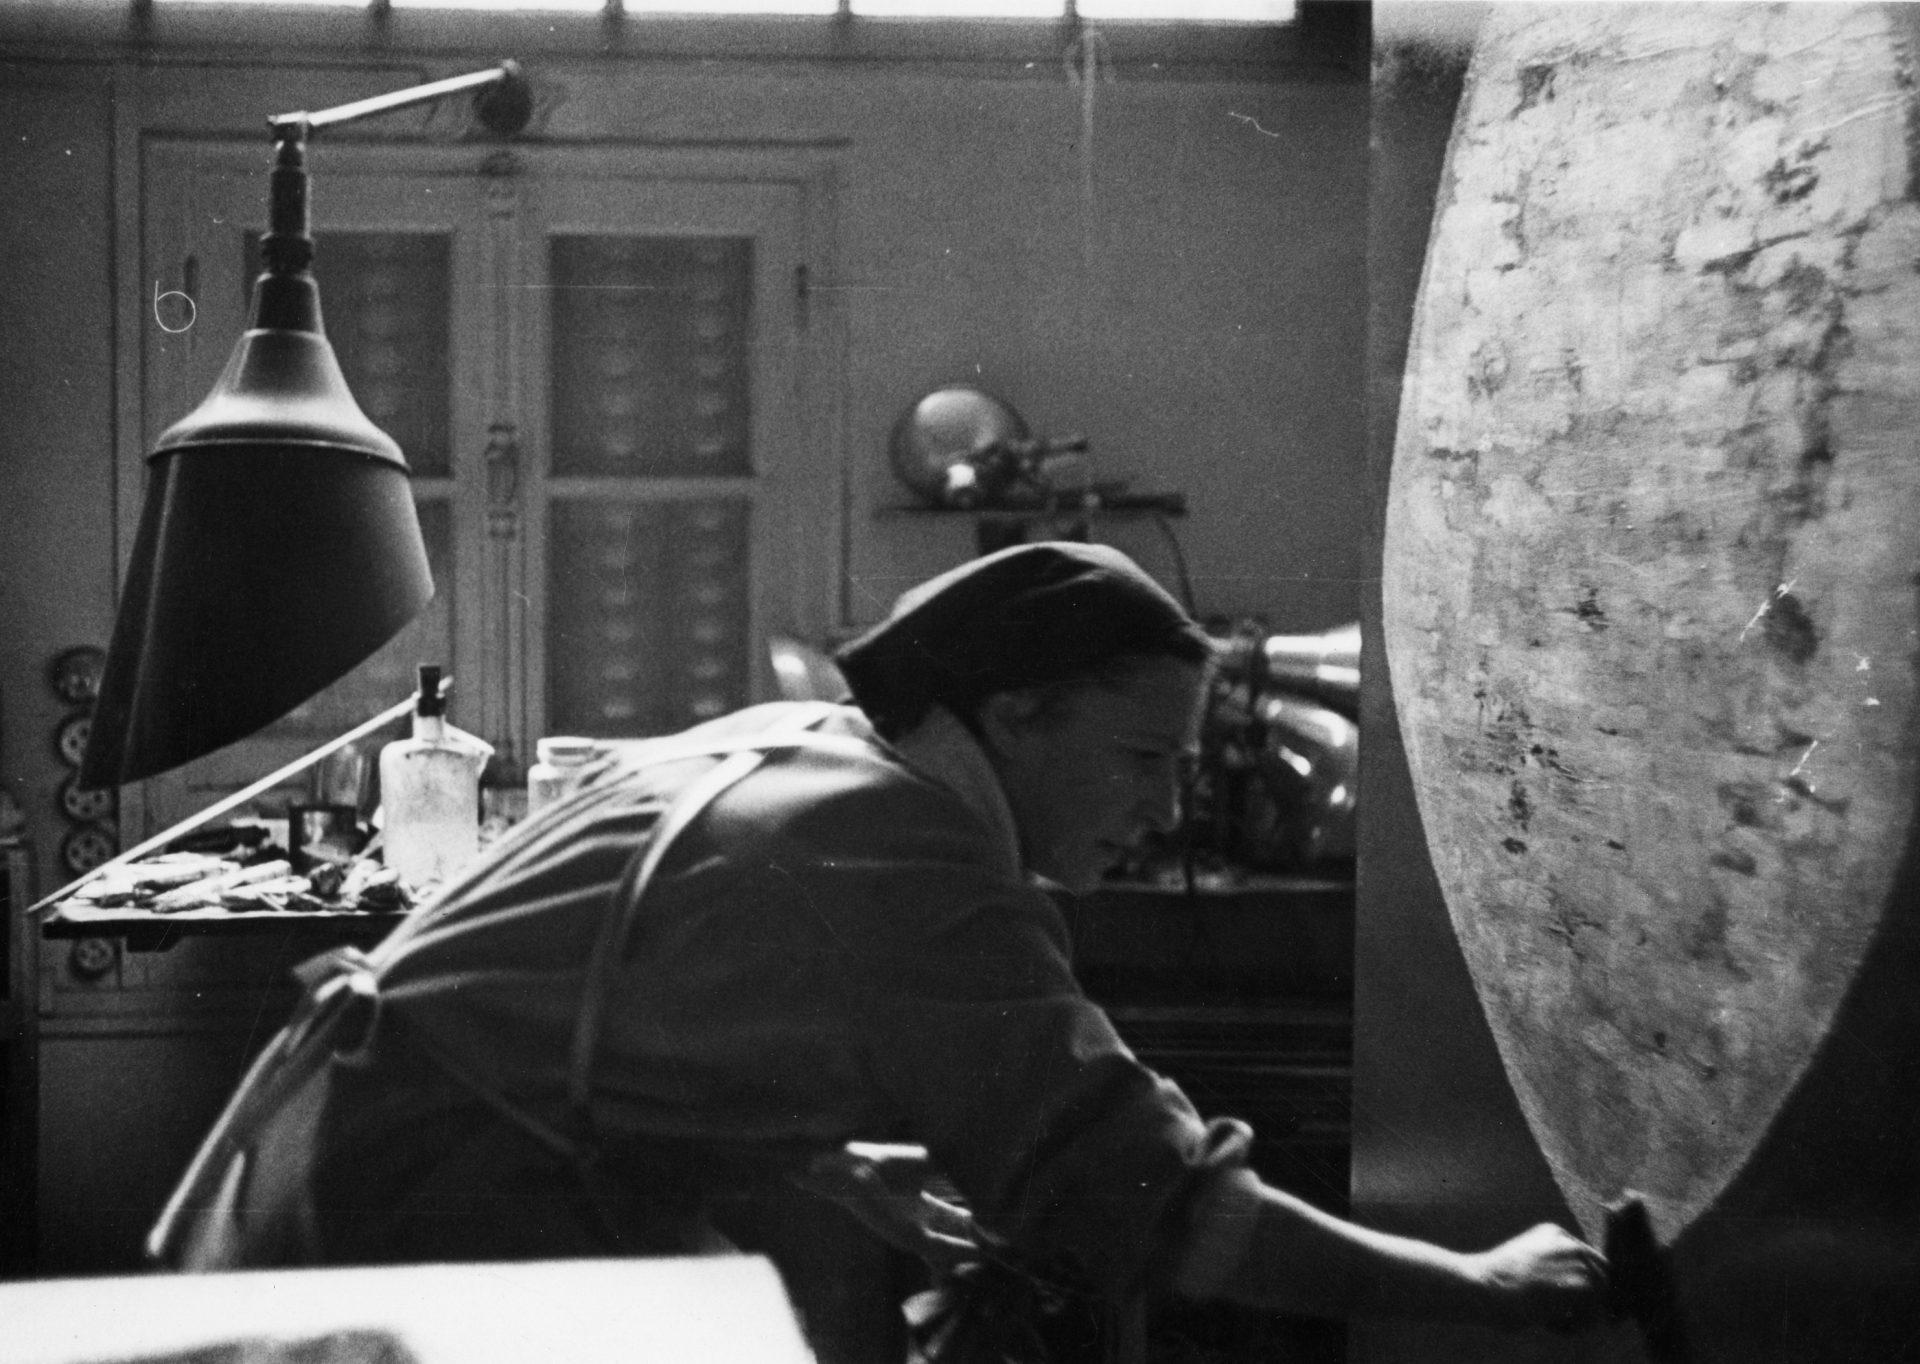 anna-eva bergman hartung-bergman fondation sorlandets kunstmuseum arttalk wenche volle nasjonalmuseet